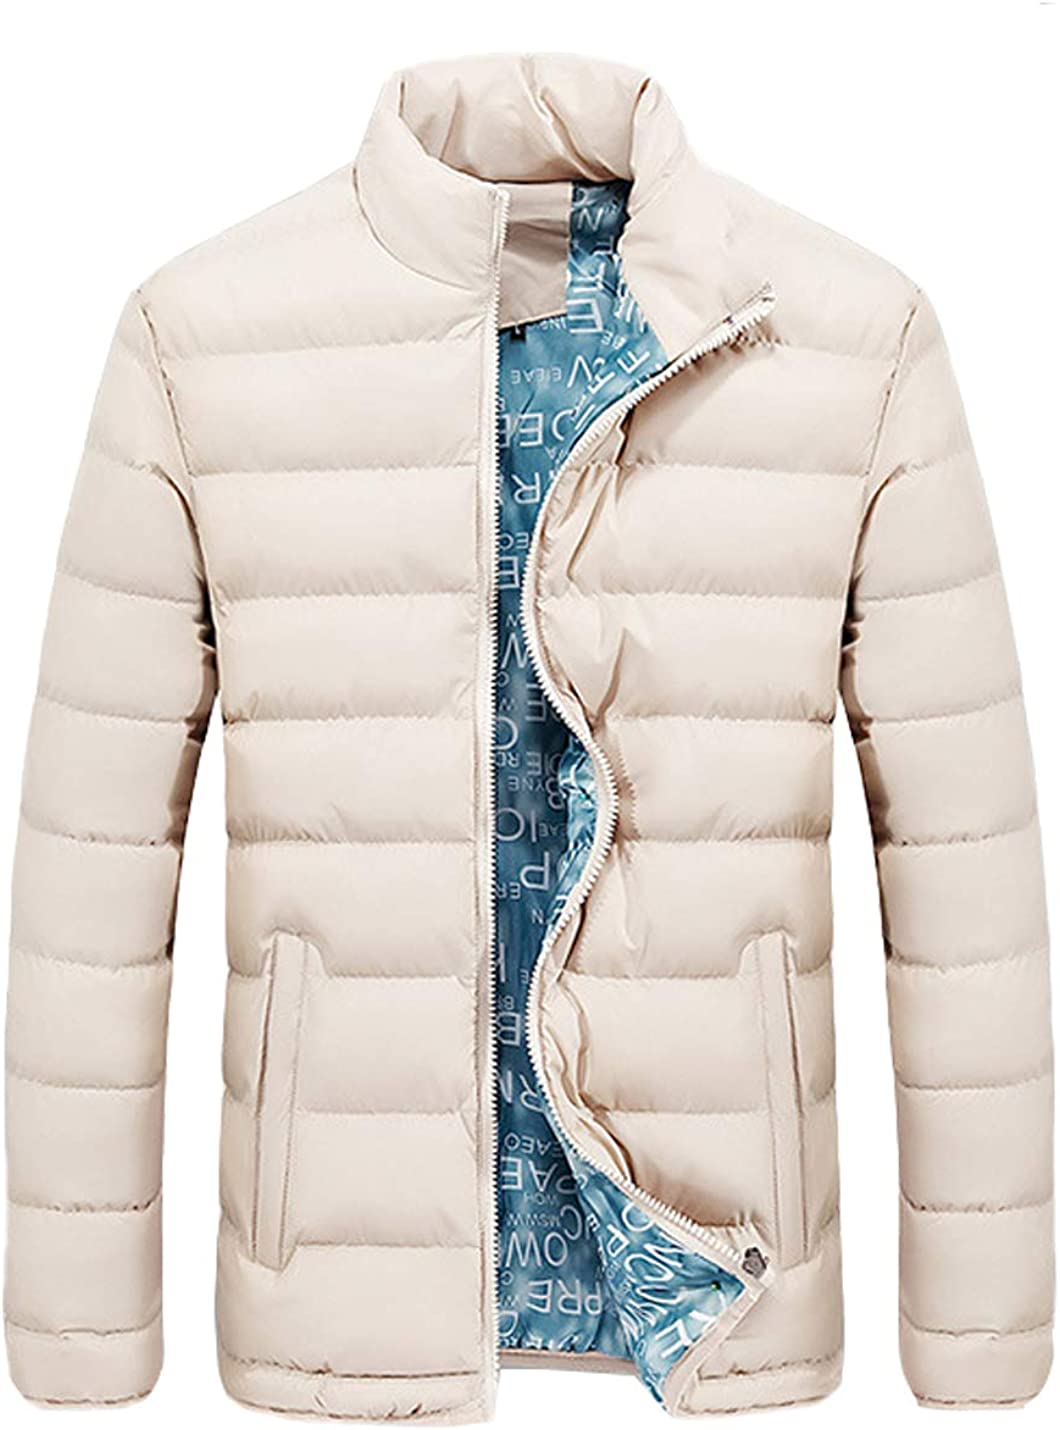 Hongsui Mens Down Alternative Jacket Puffer Coat Packable Warm Insulation